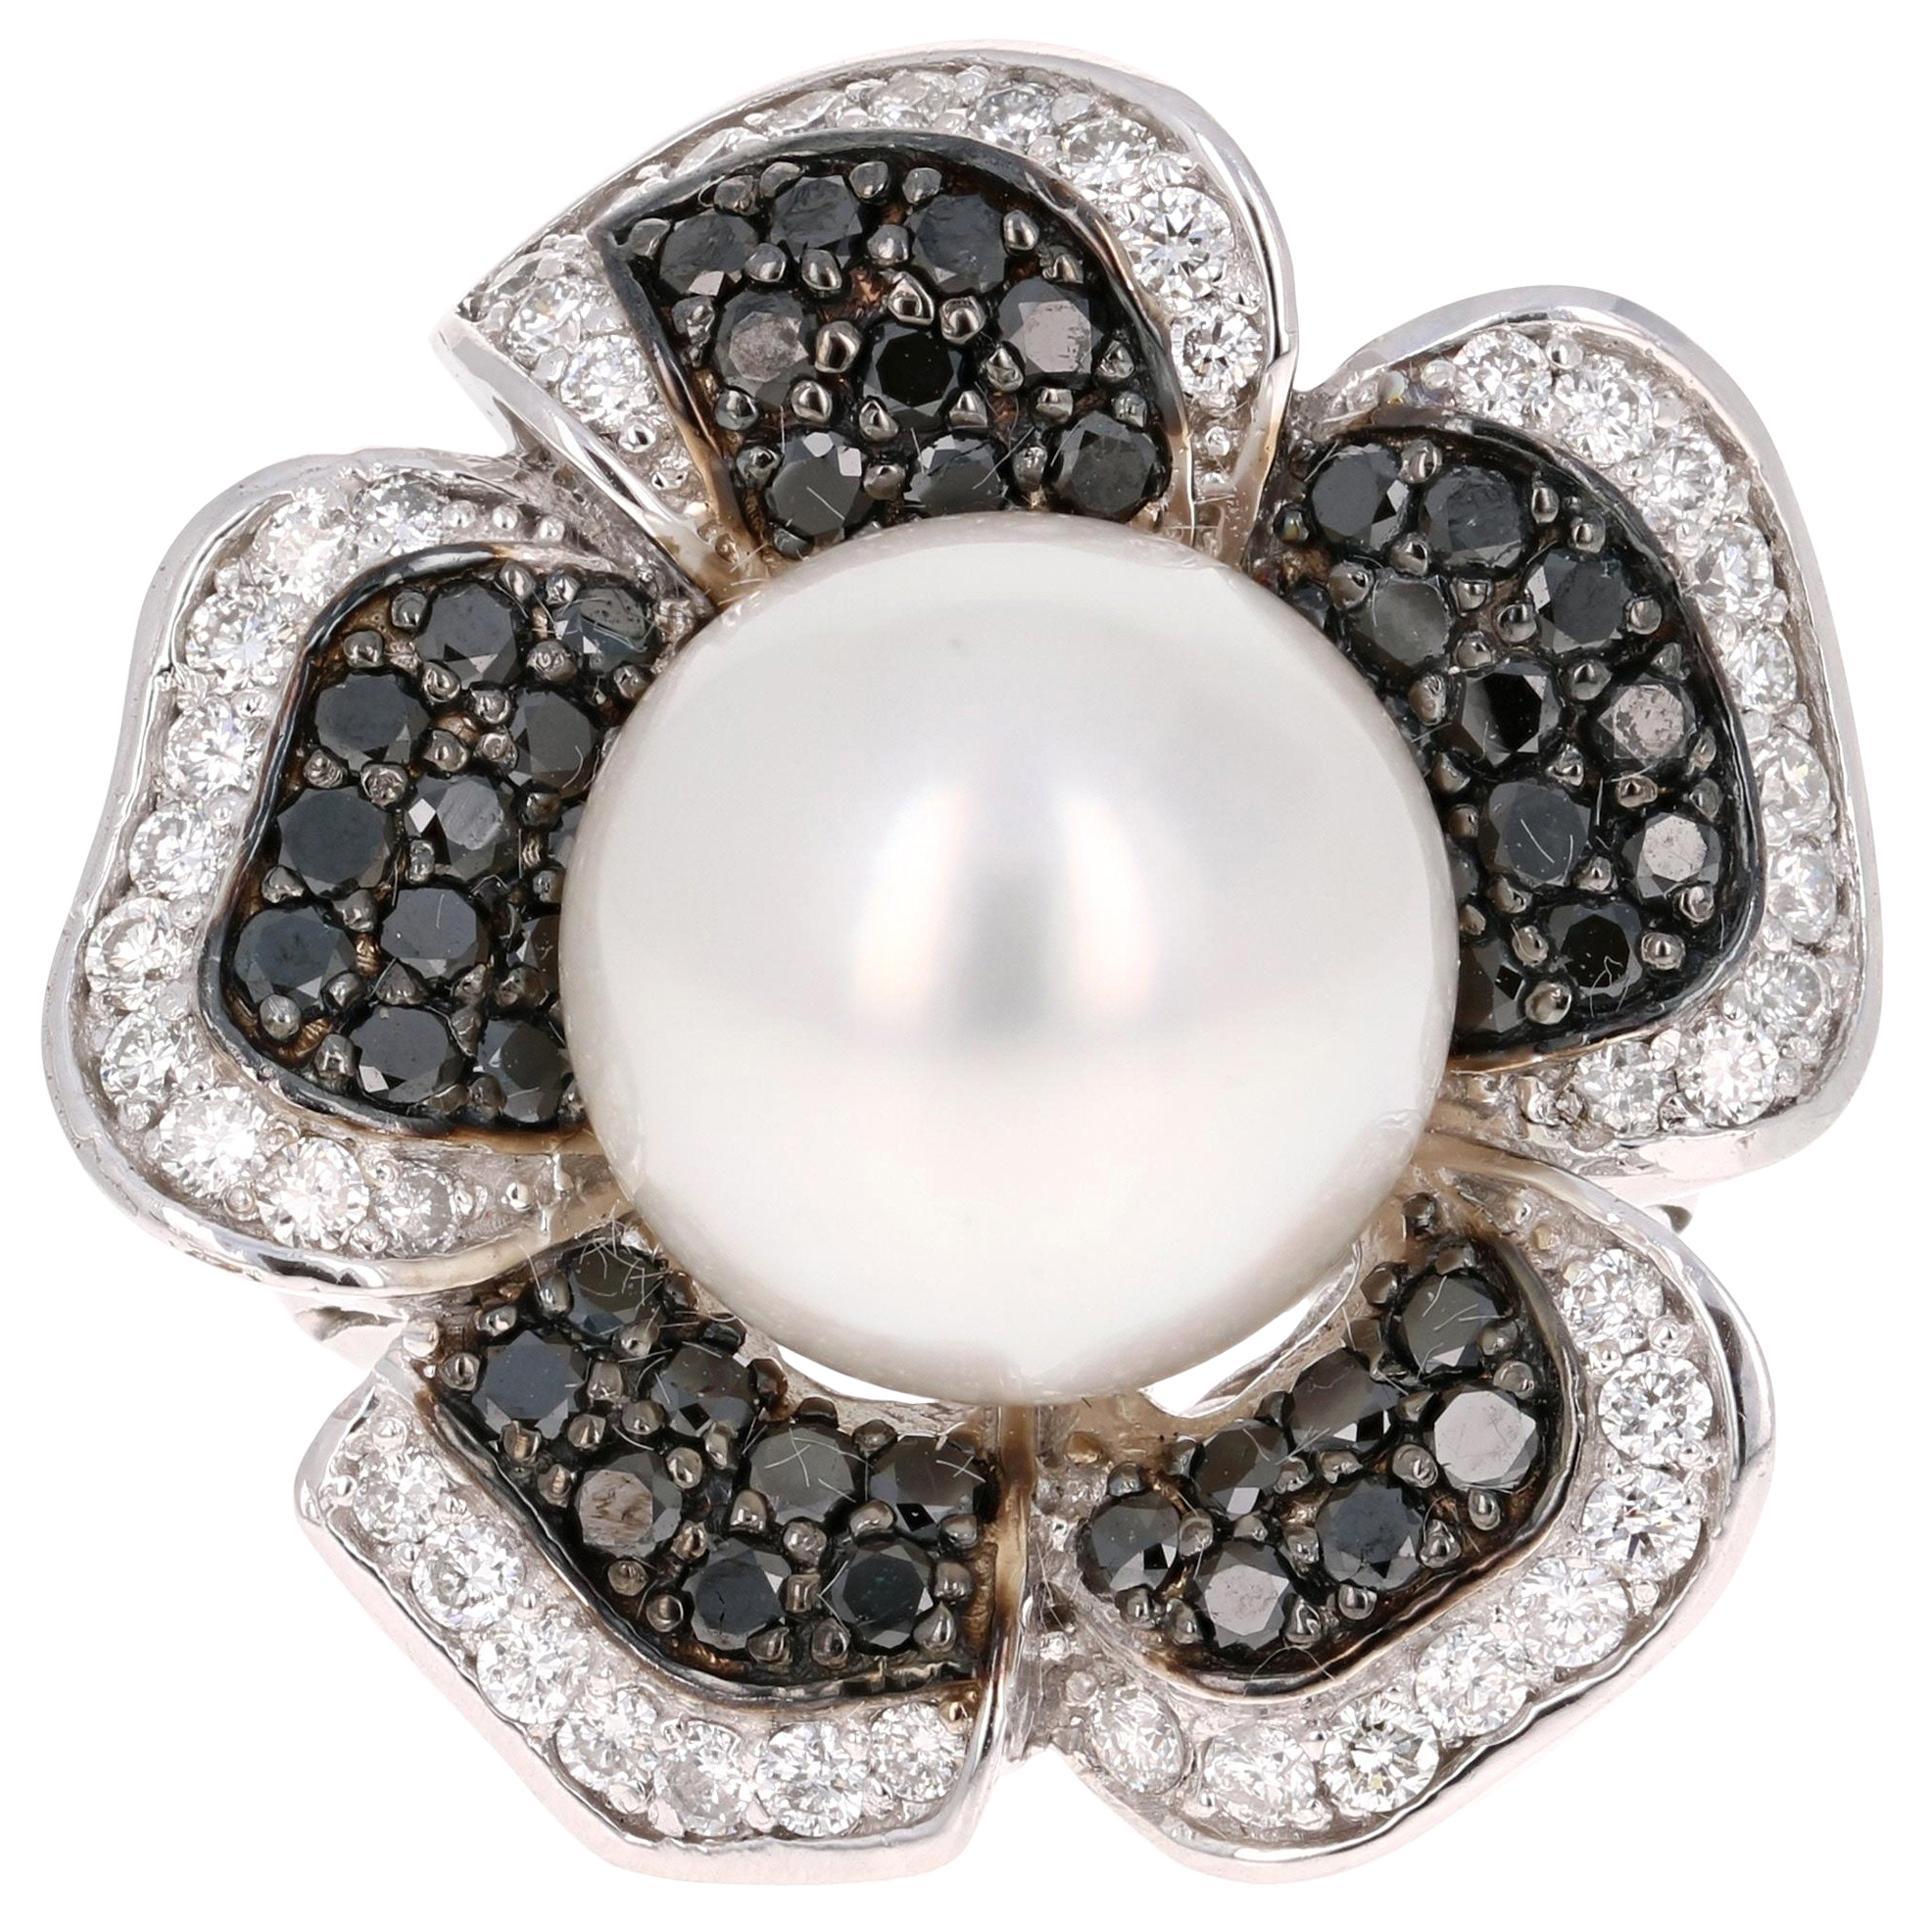 2.08 Carat South Sea Pearl Black White Diamond White Gold Cocktail Ring